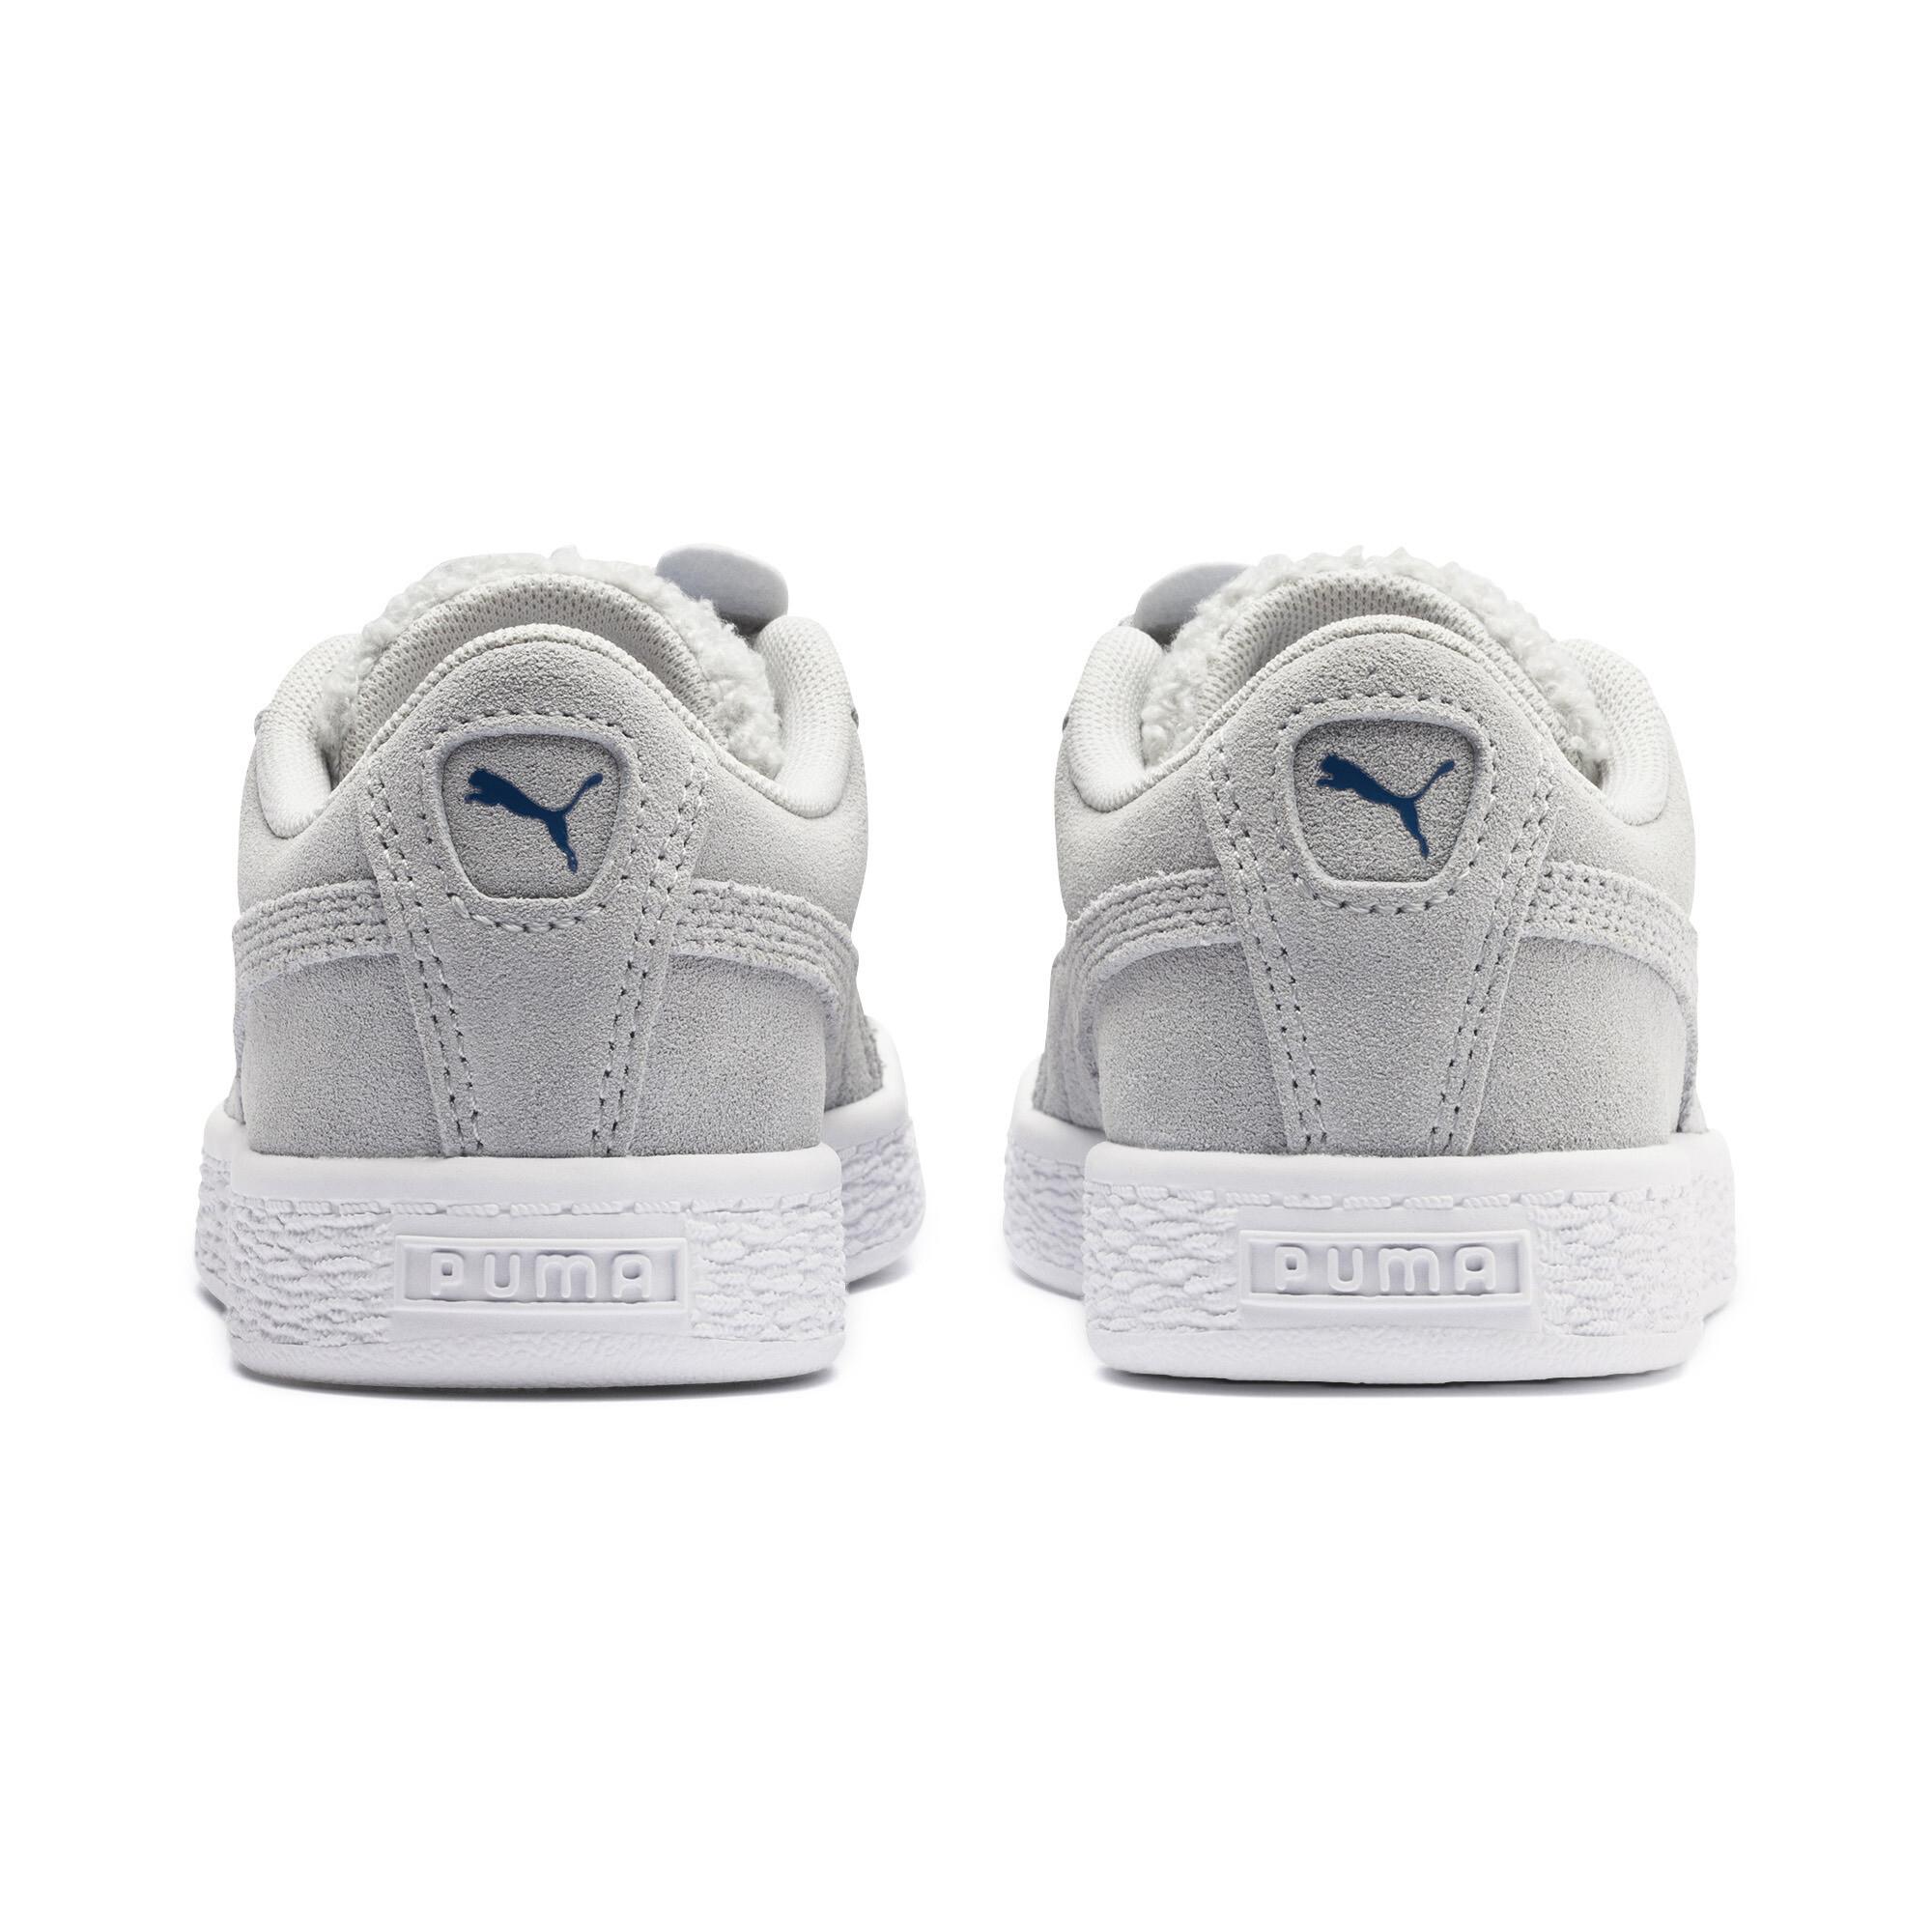 PUMA-Suede-Winter-Monster-Little-Kids-039-Shoes-Kids-Shoe-Kids thumbnail 10